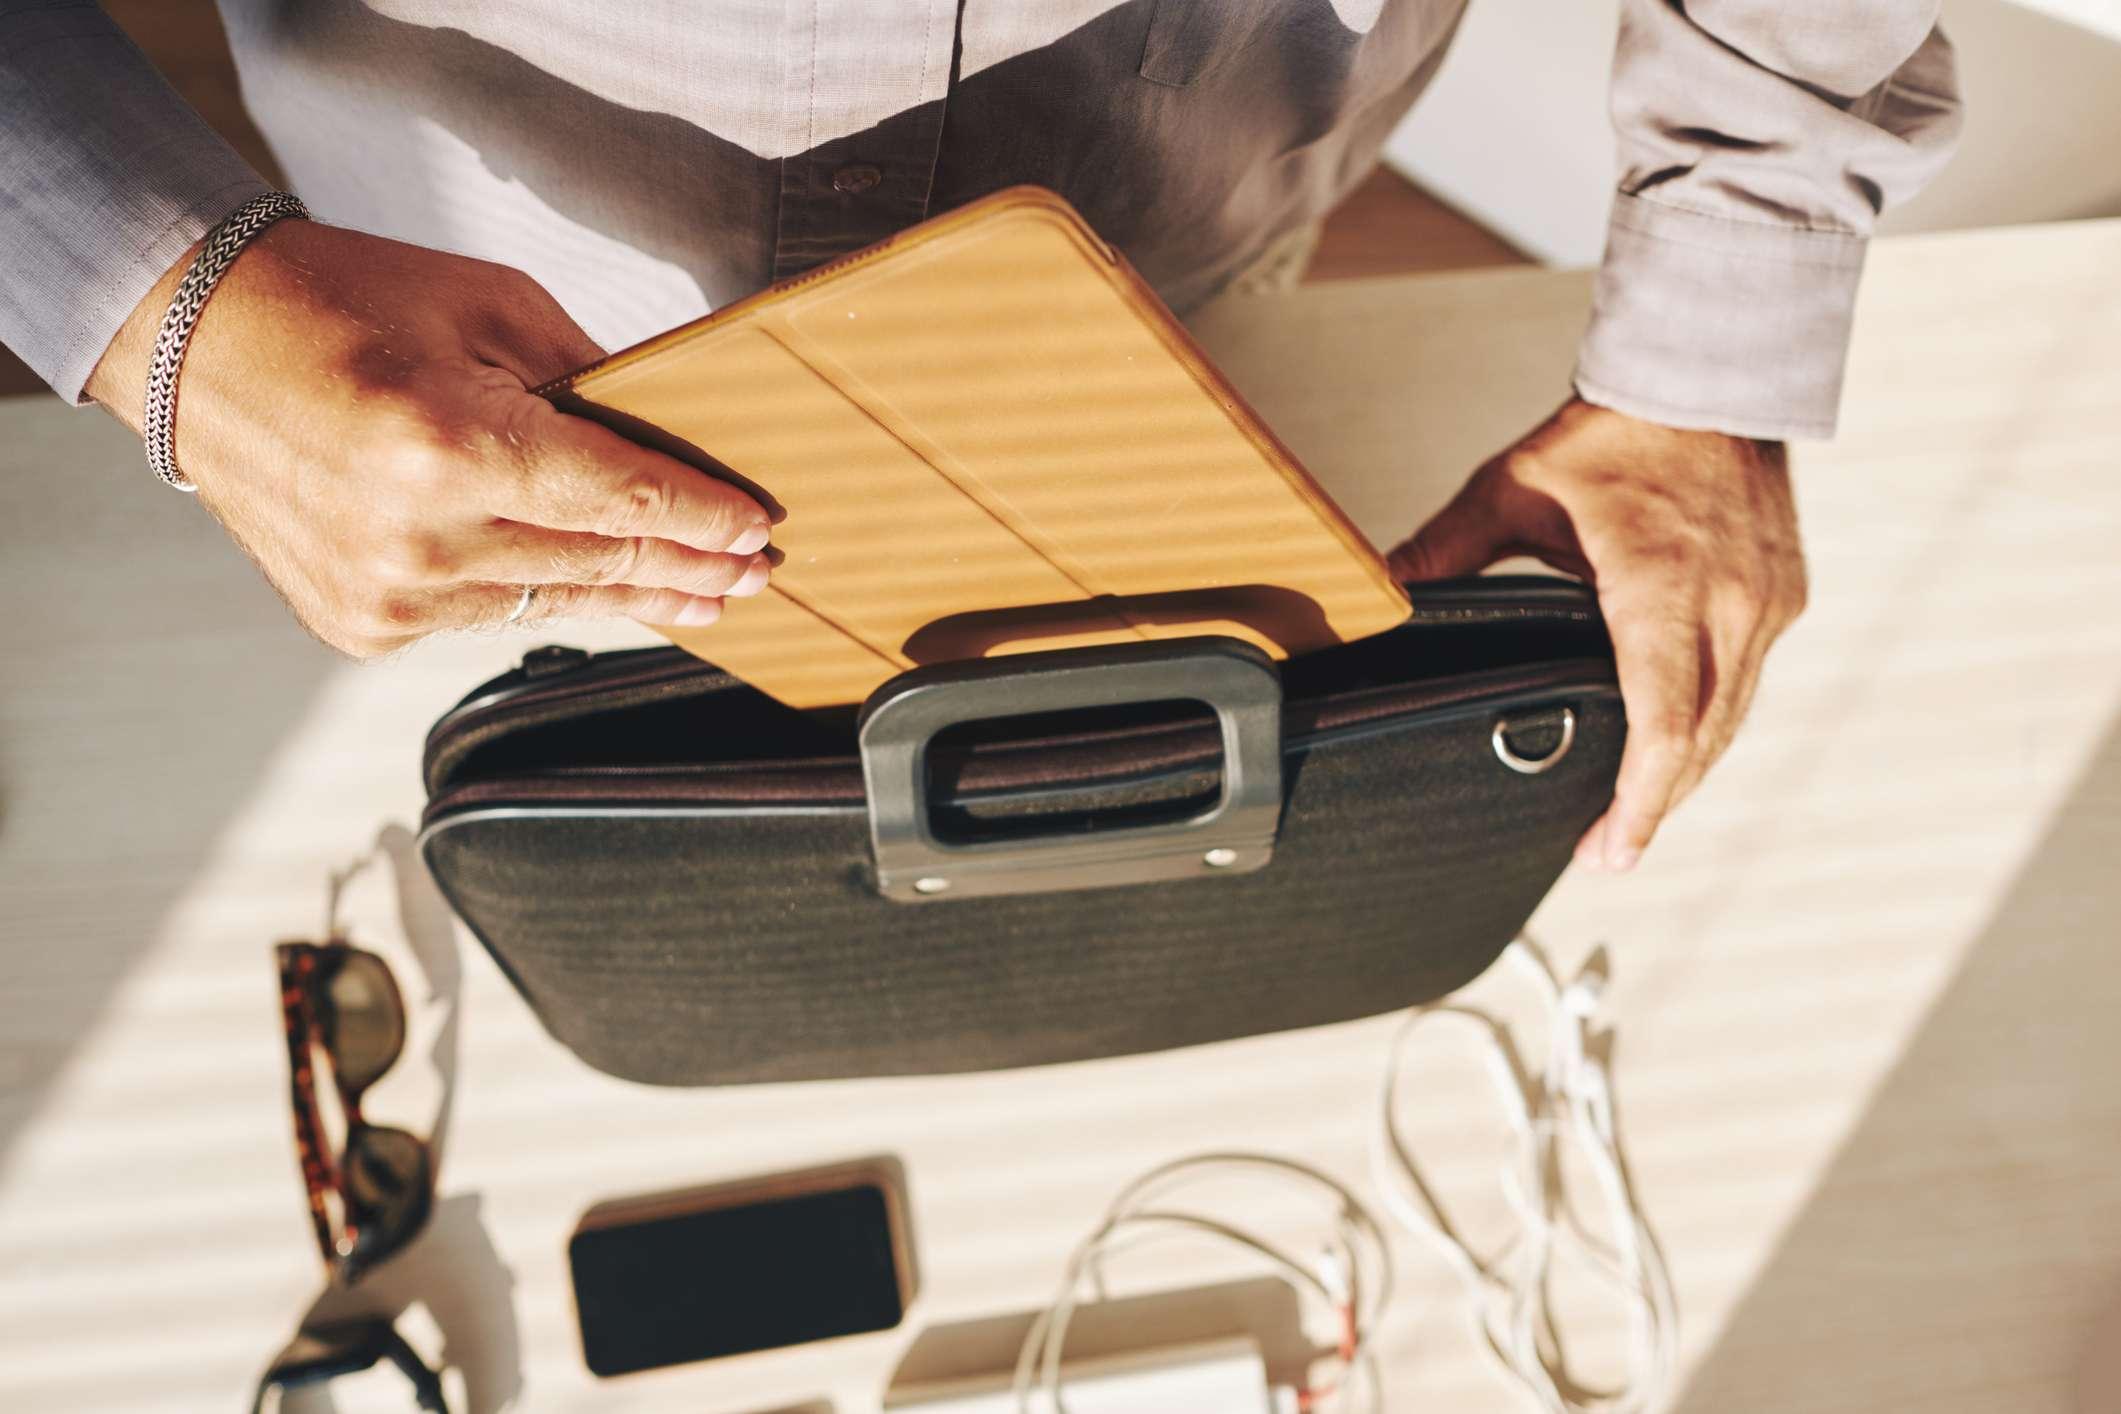 iPad case being put in a briefcase